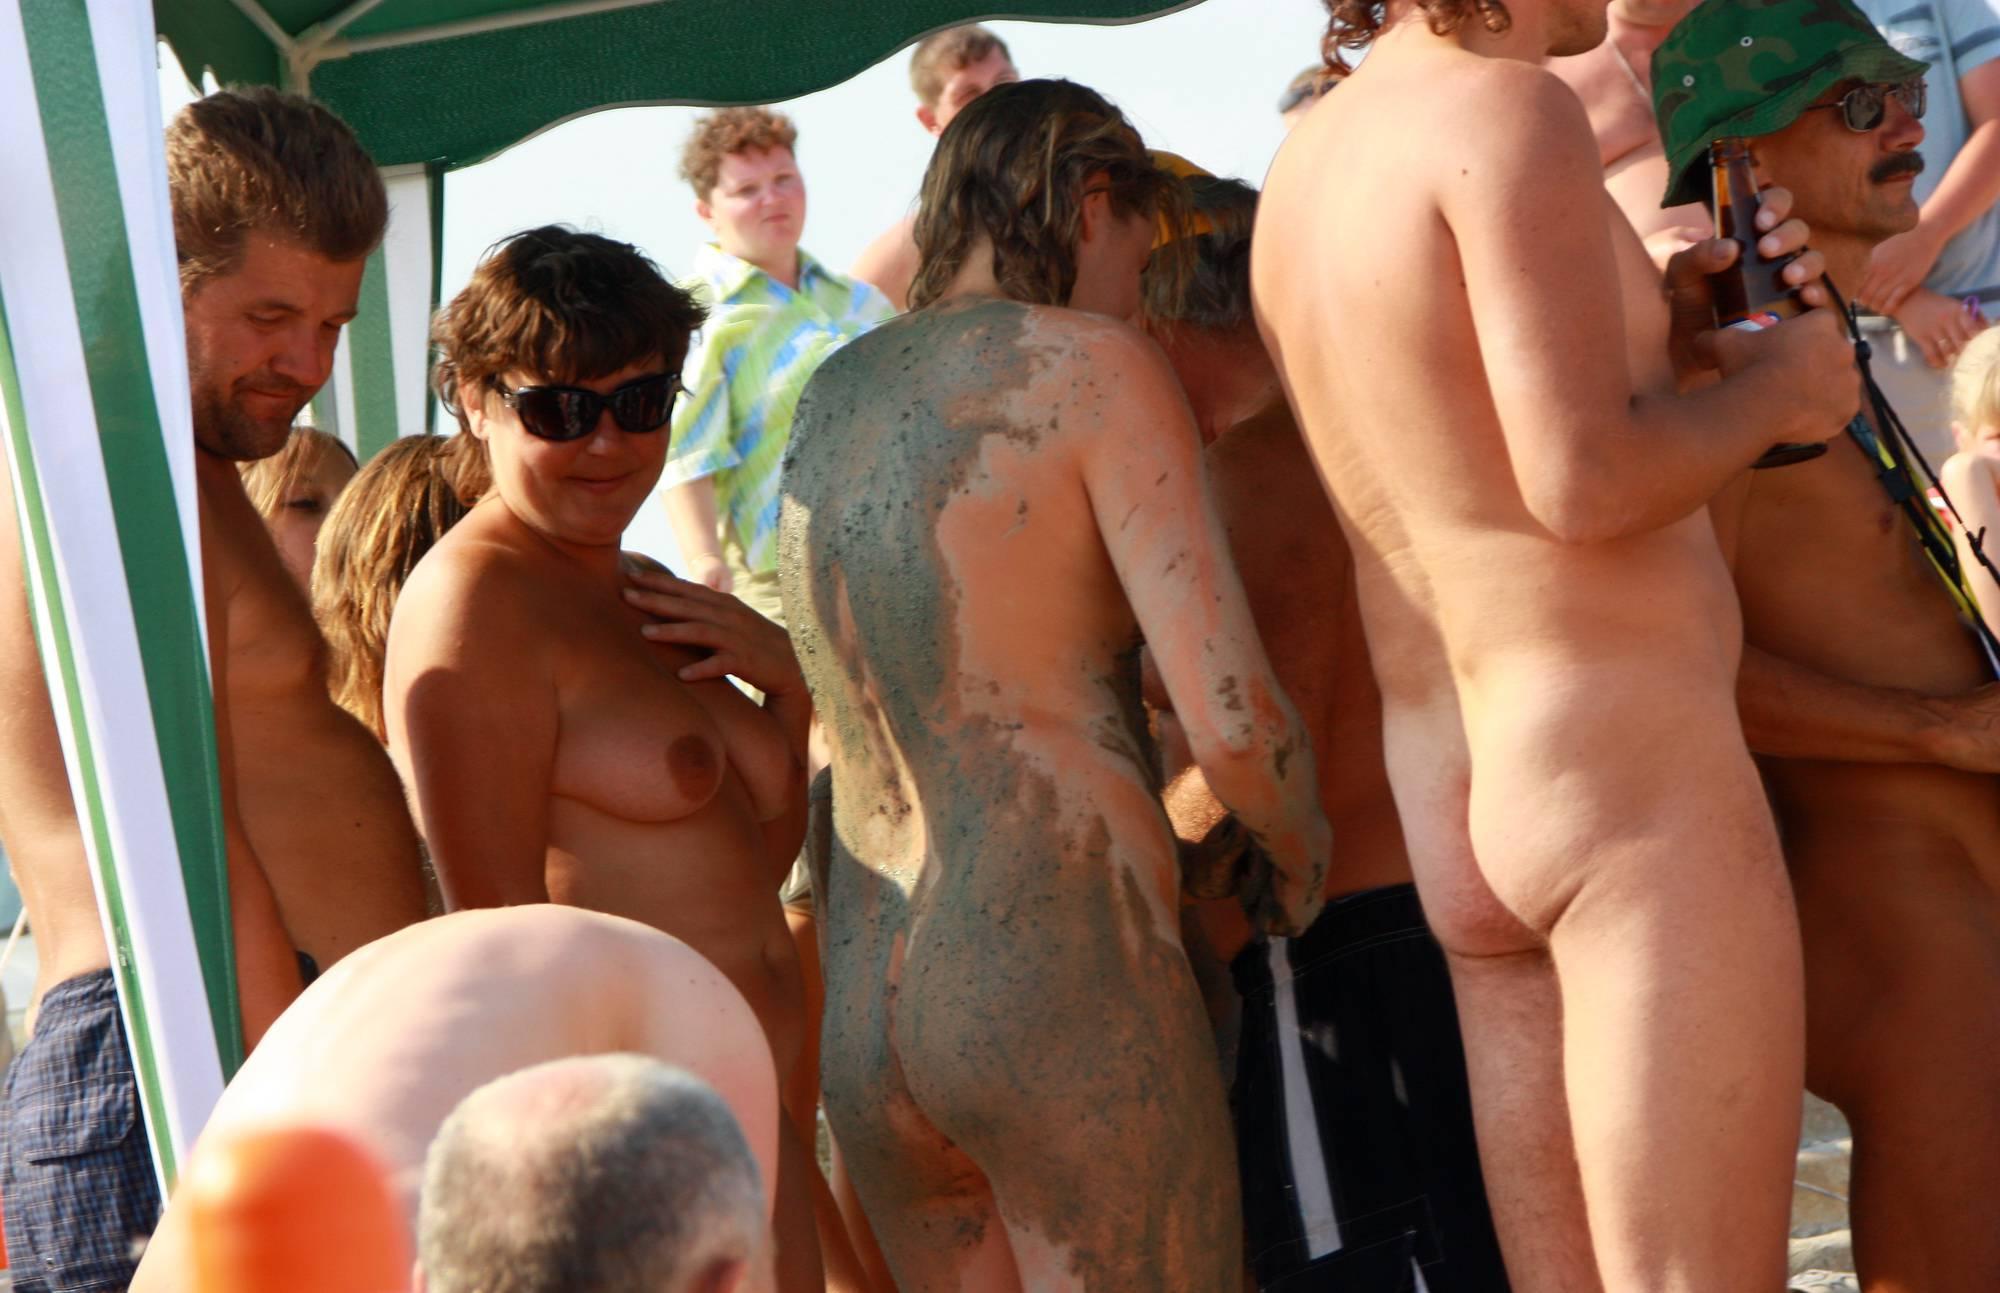 Nudist Pics Neptune Grandmas Dance - 2